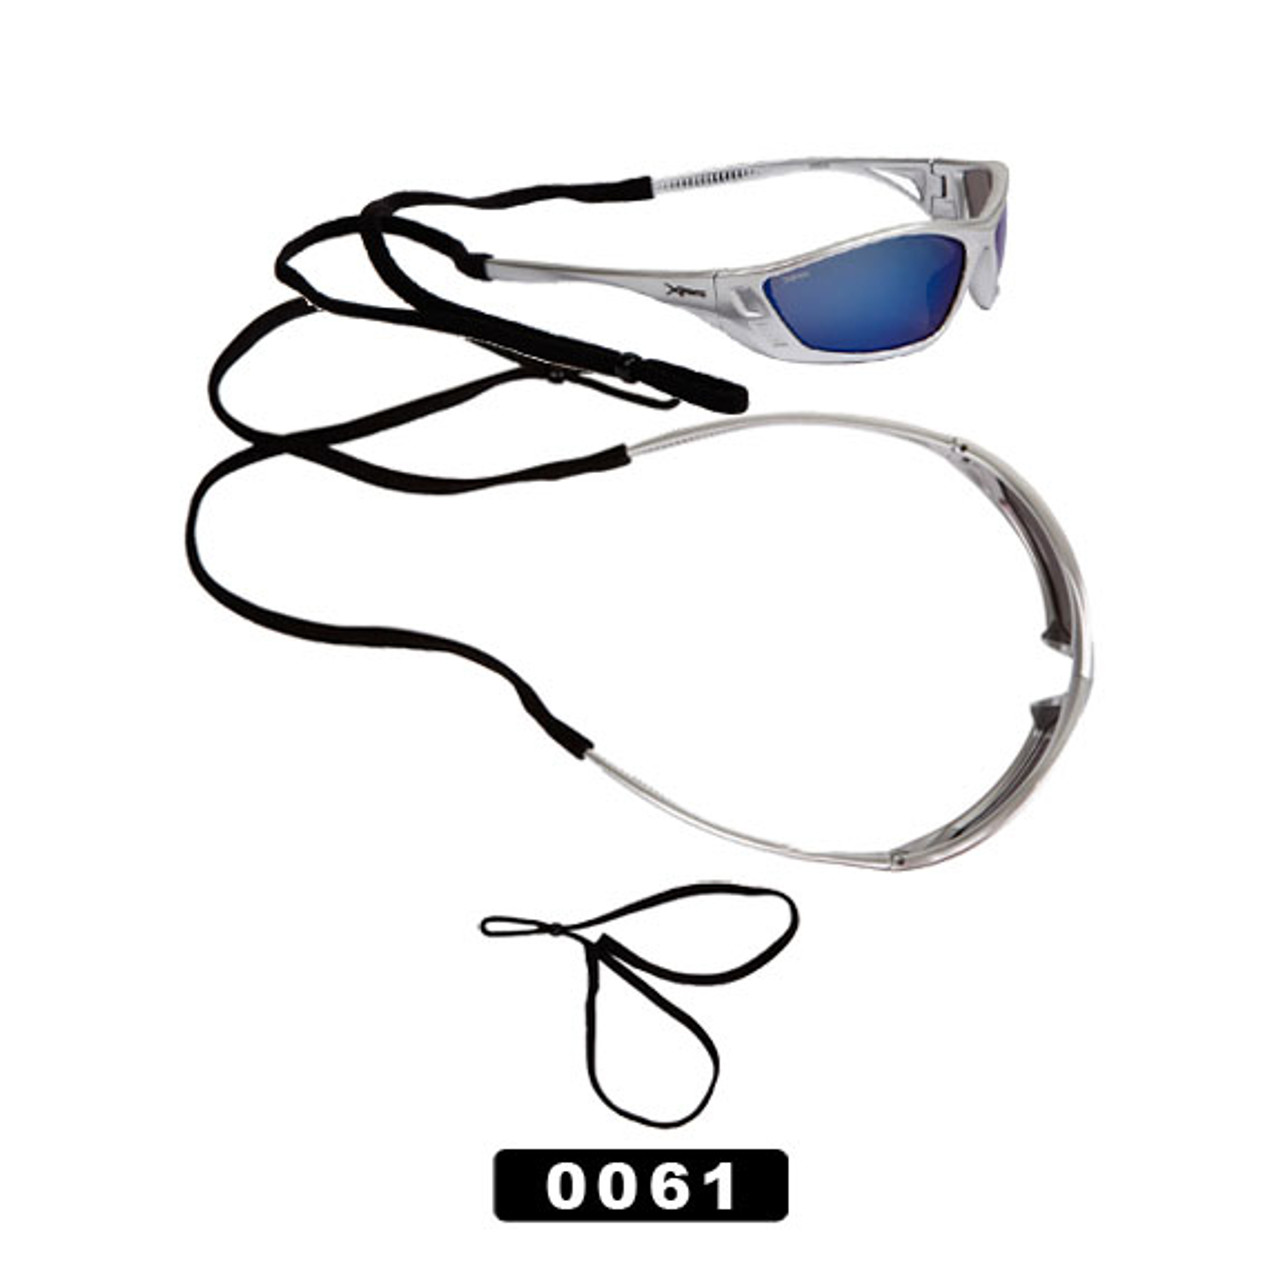 Adjustable Sunglass Straps ~ Fits smaller framed sunglasses. 0061 (12 pcs.)